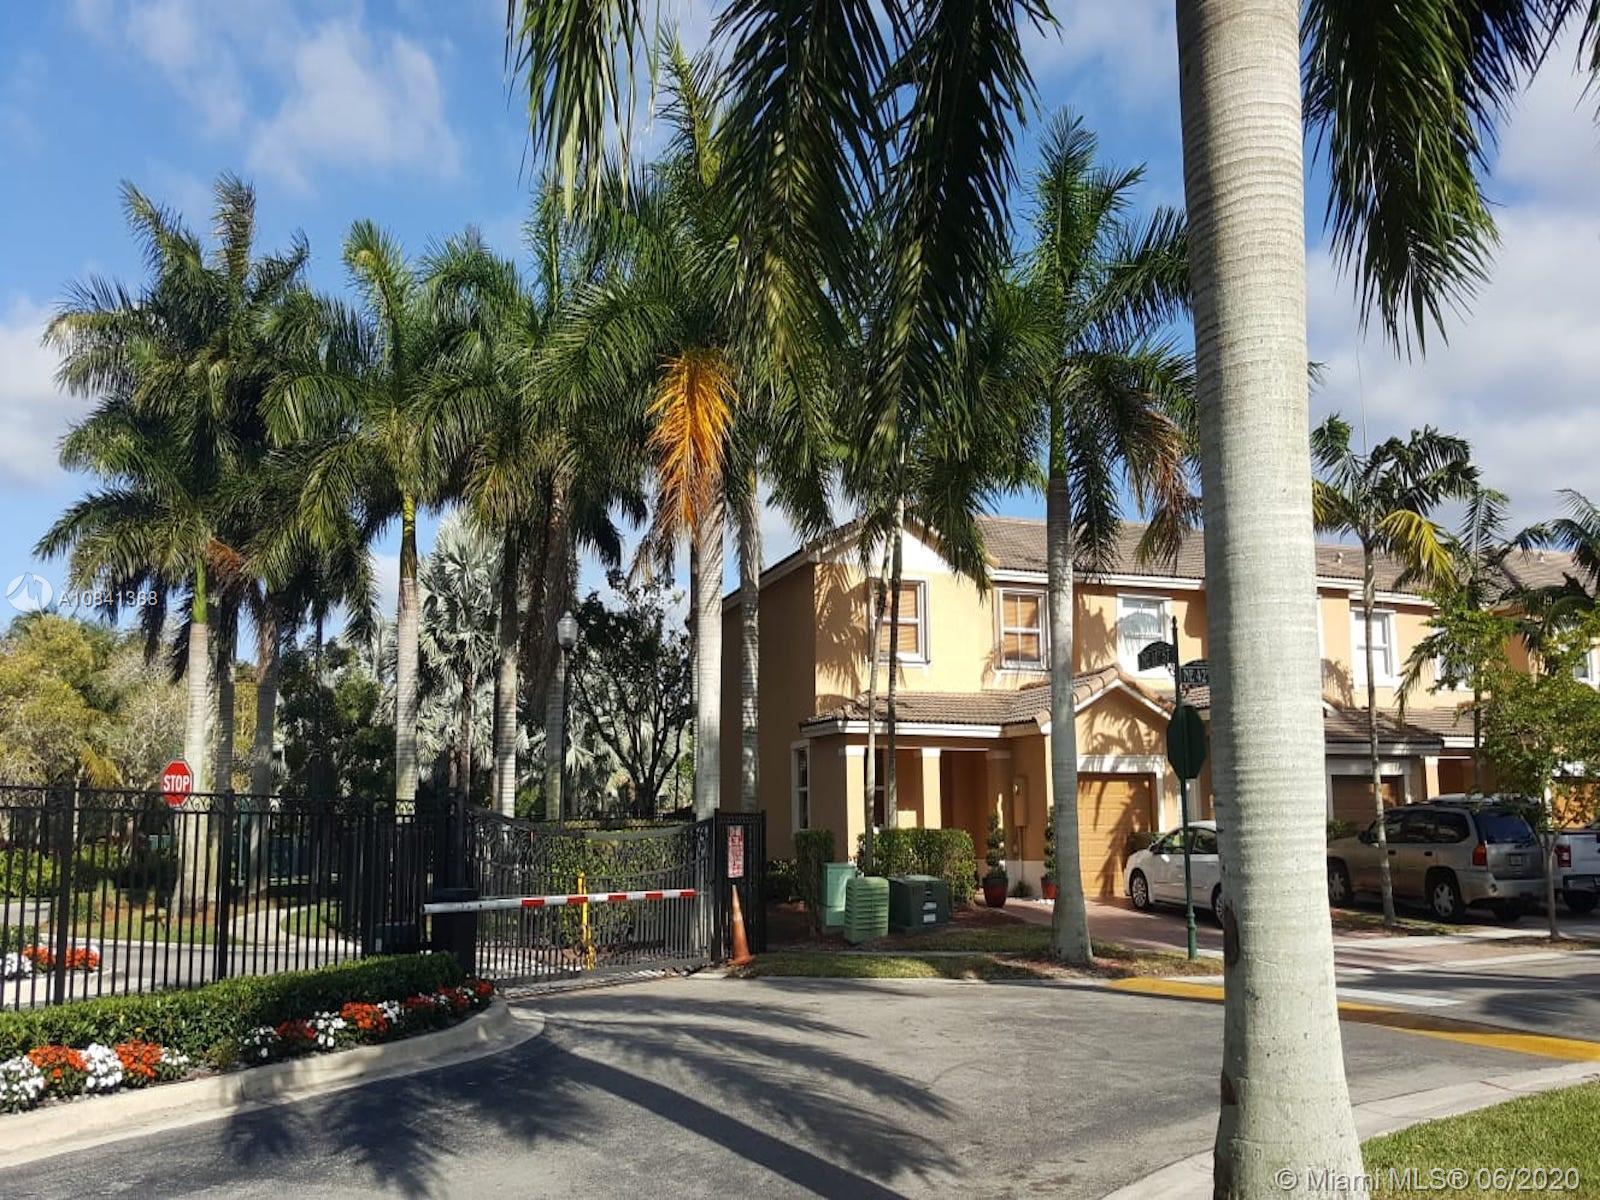 917 NE 42nd Ave, Homestead, FL 33033 - Homestead, FL real estate listing